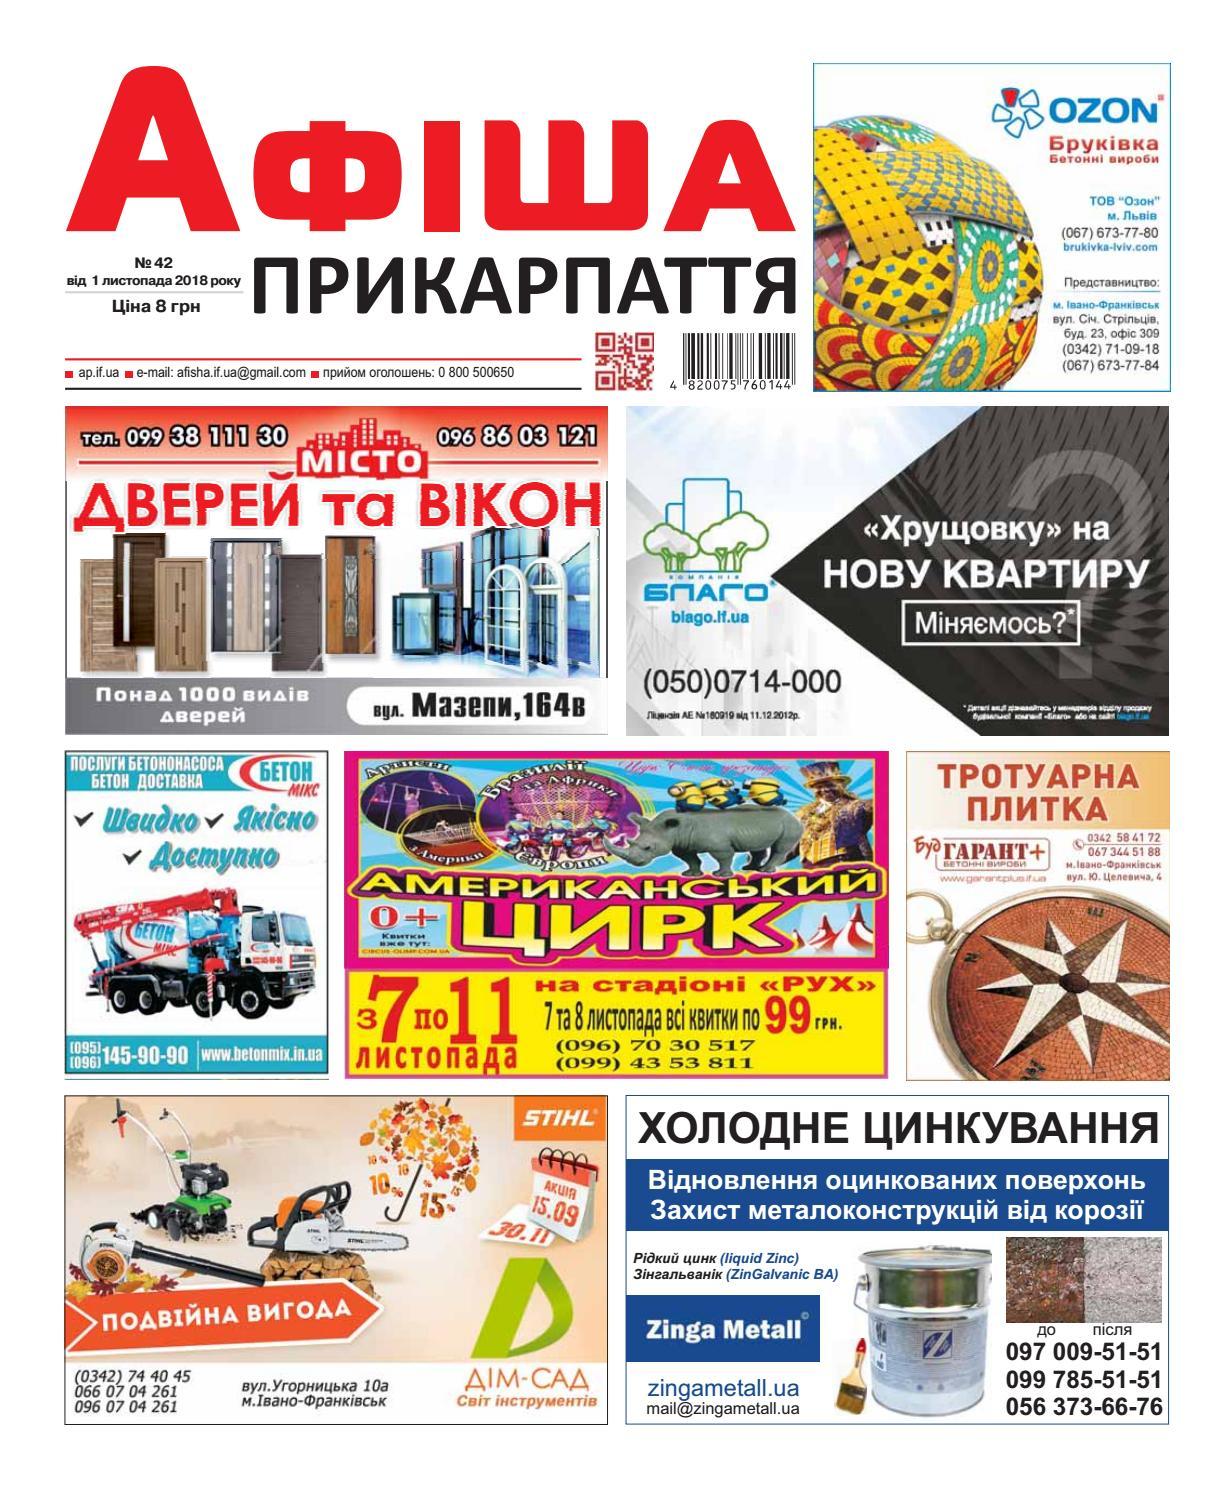 Афіша Прикарпаття №42 by Olya Olya - issuu e7a510b2ae677